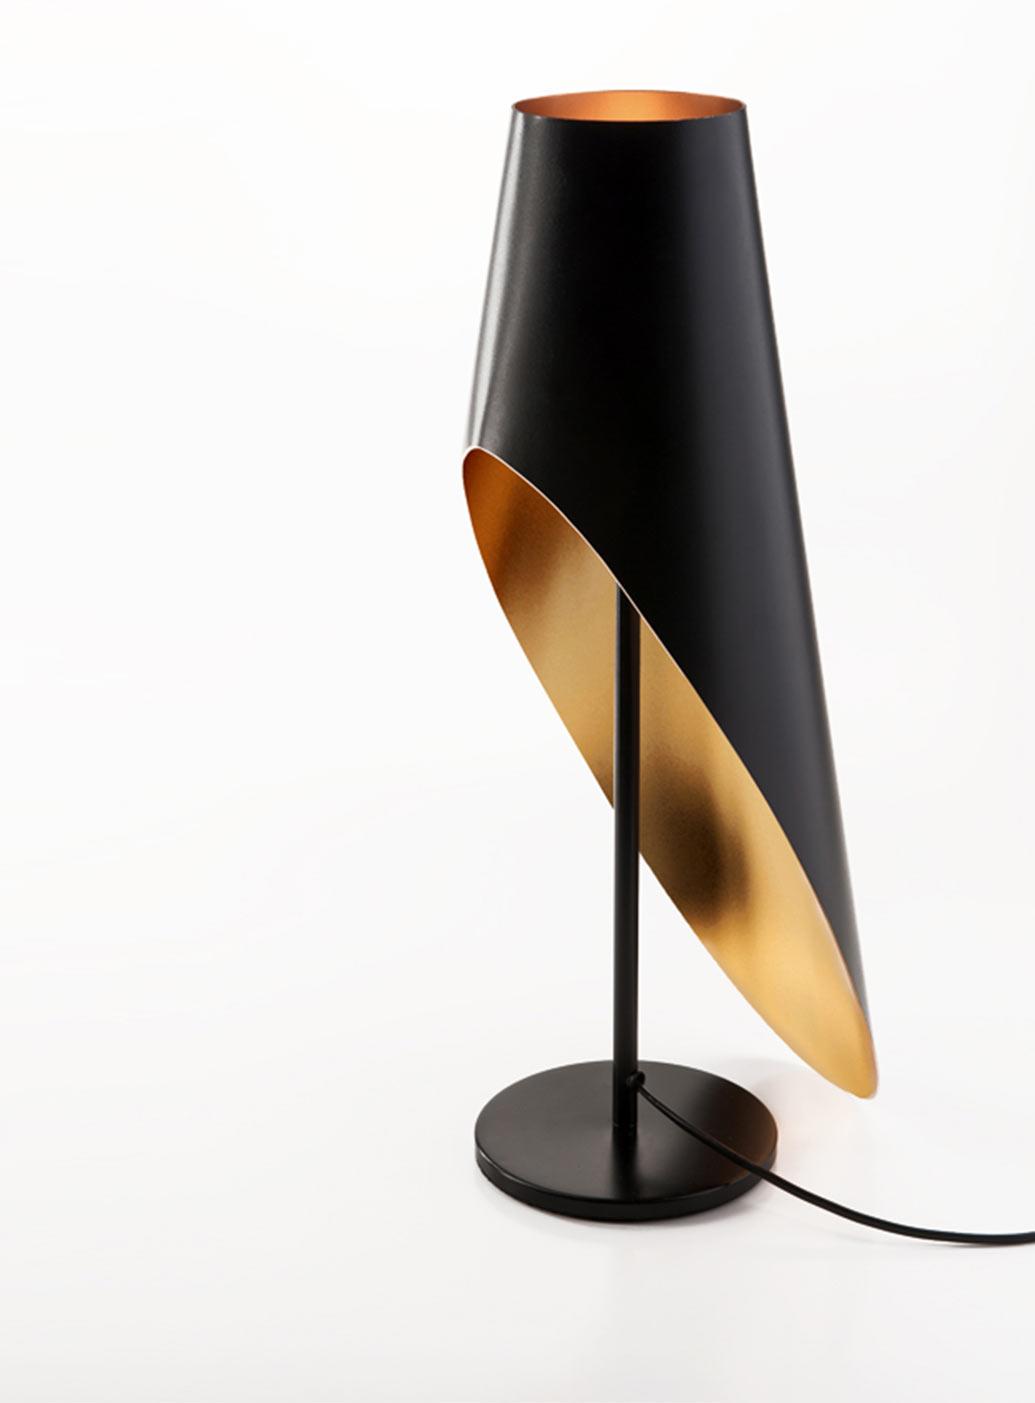 intrigue-lamp-gold-black-elegance-1